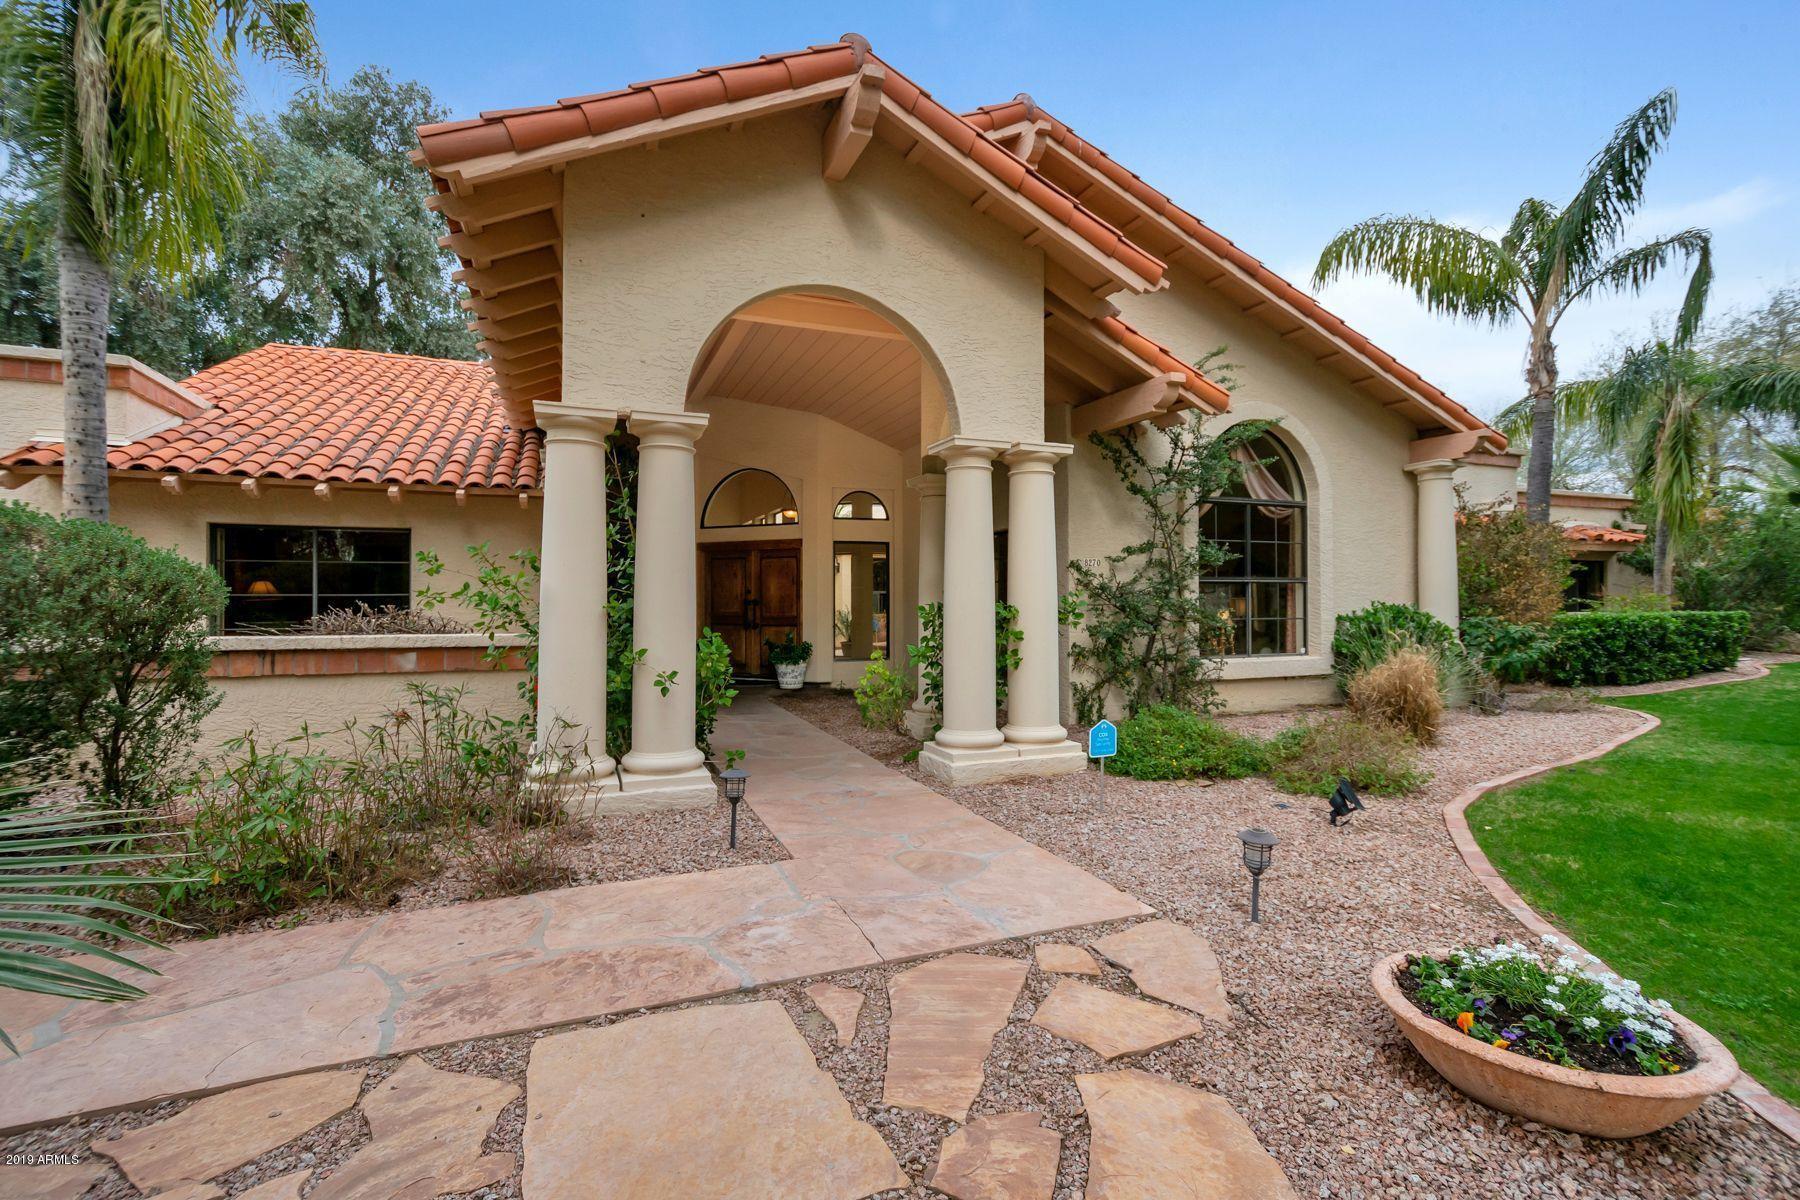 MLS 5874246 8270 E WOOD Drive, Scottsdale, AZ 85260 Scottsdale AZ Private Pool